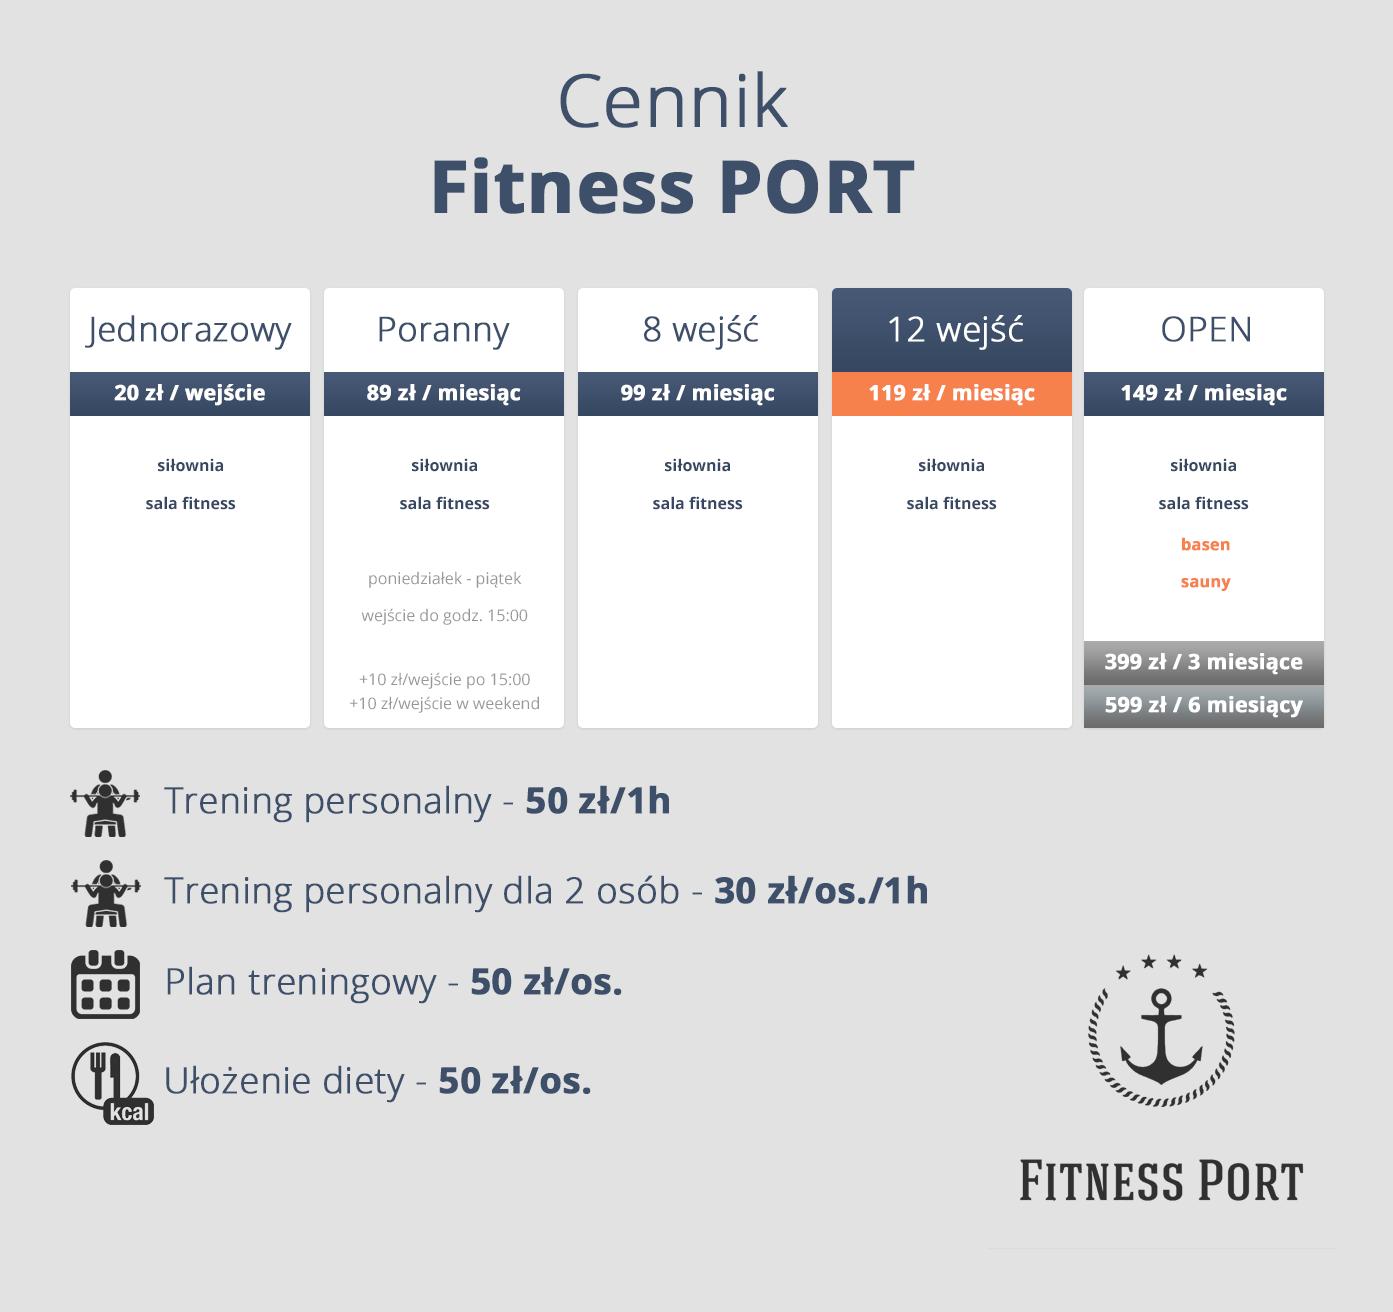 Cennik Fitness PORT